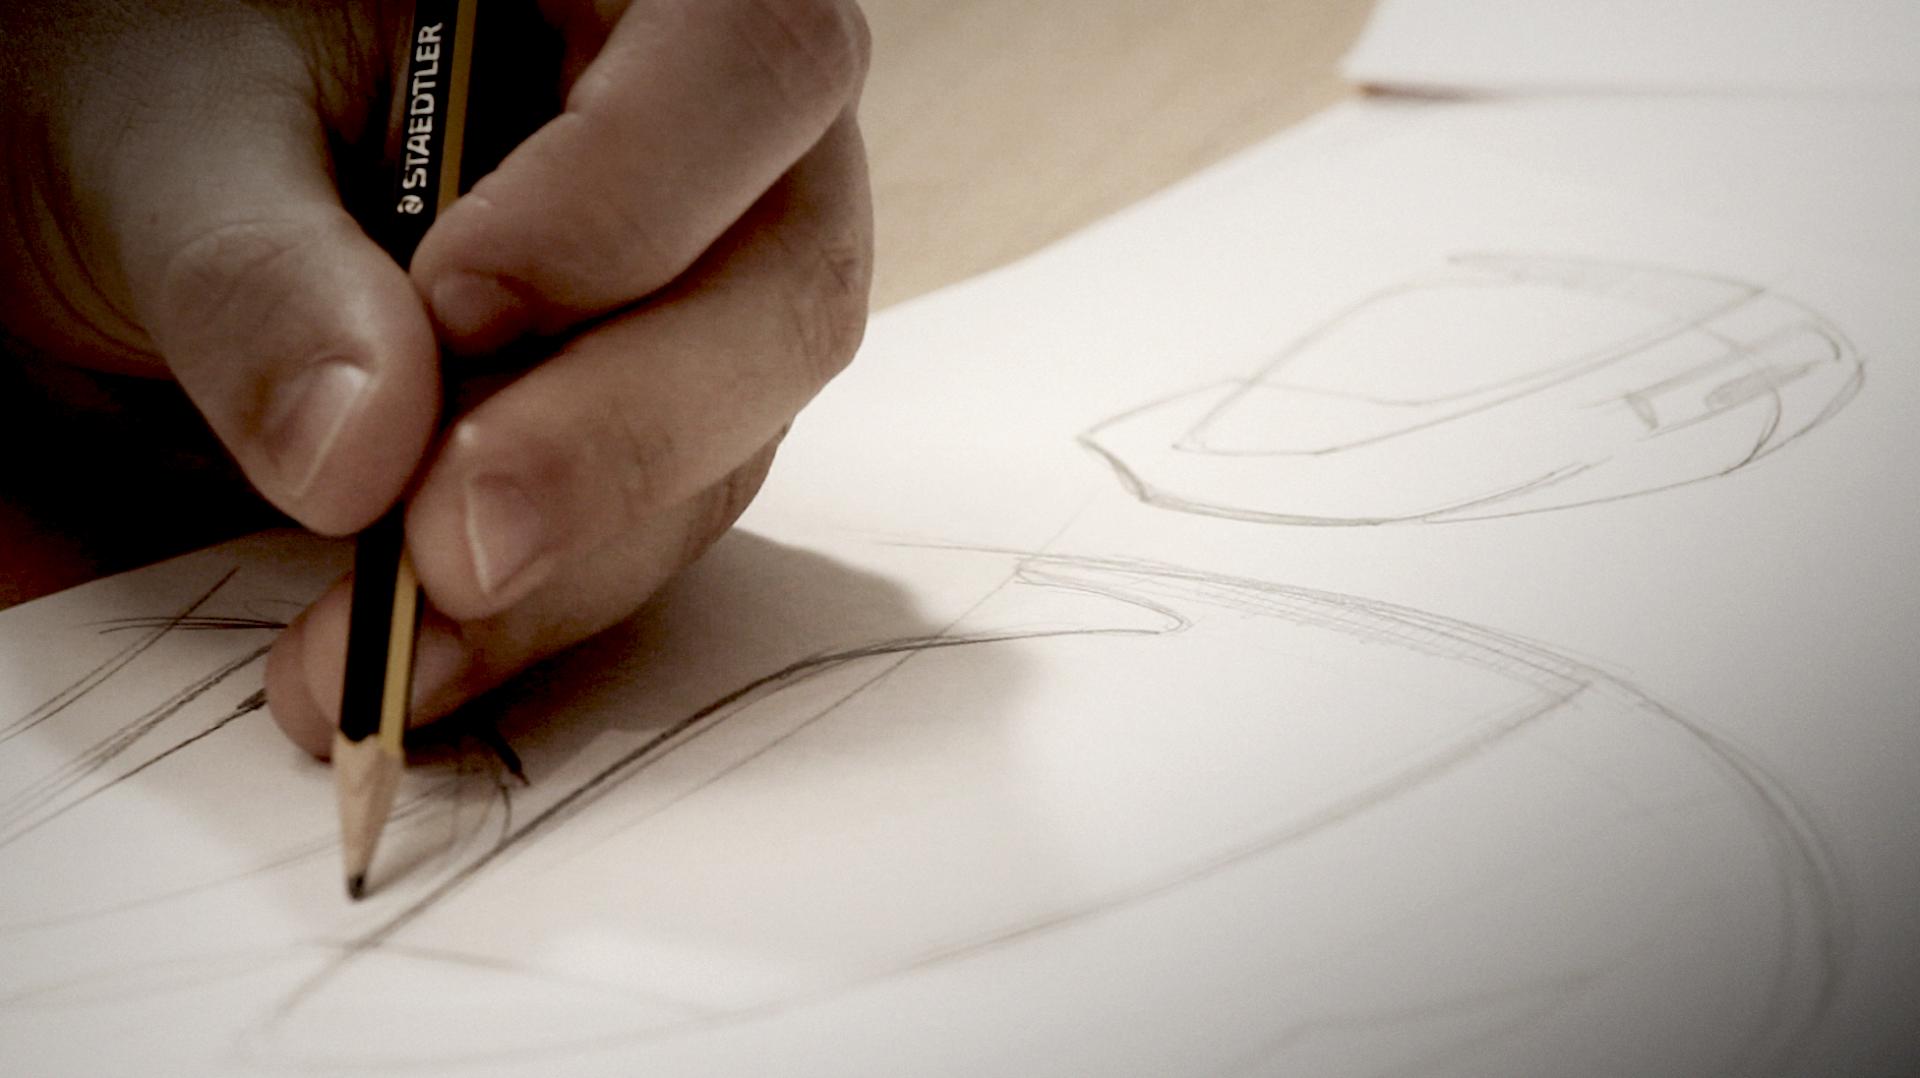 Hand drawing a motorbike helmet on paper